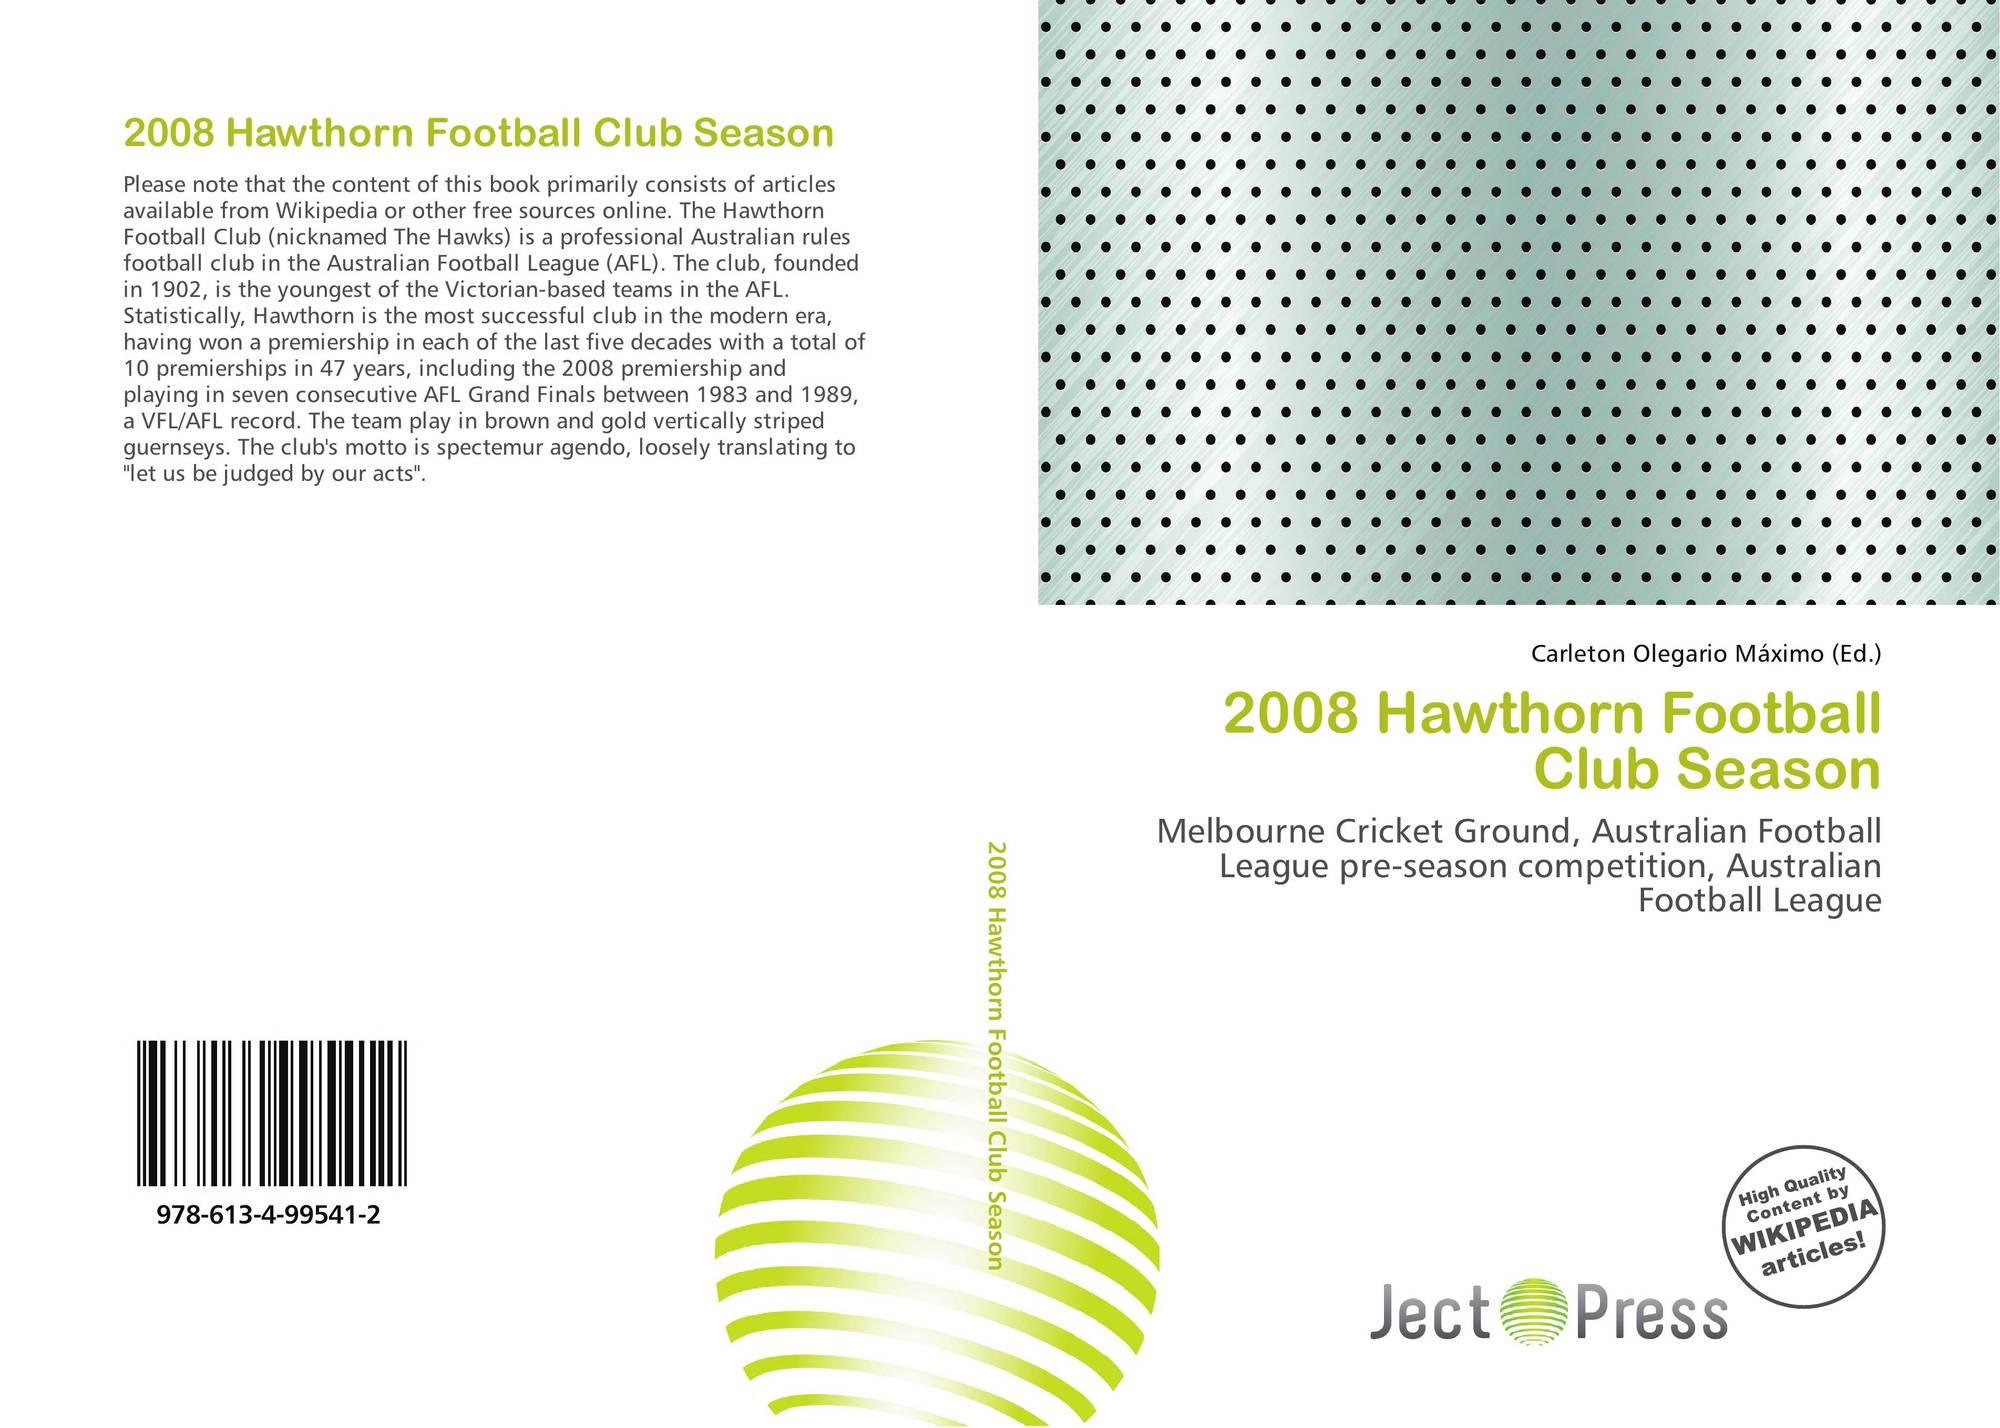 2008 Hawthorn Football Club Season, 978-613-4-99541-2, 613499541X